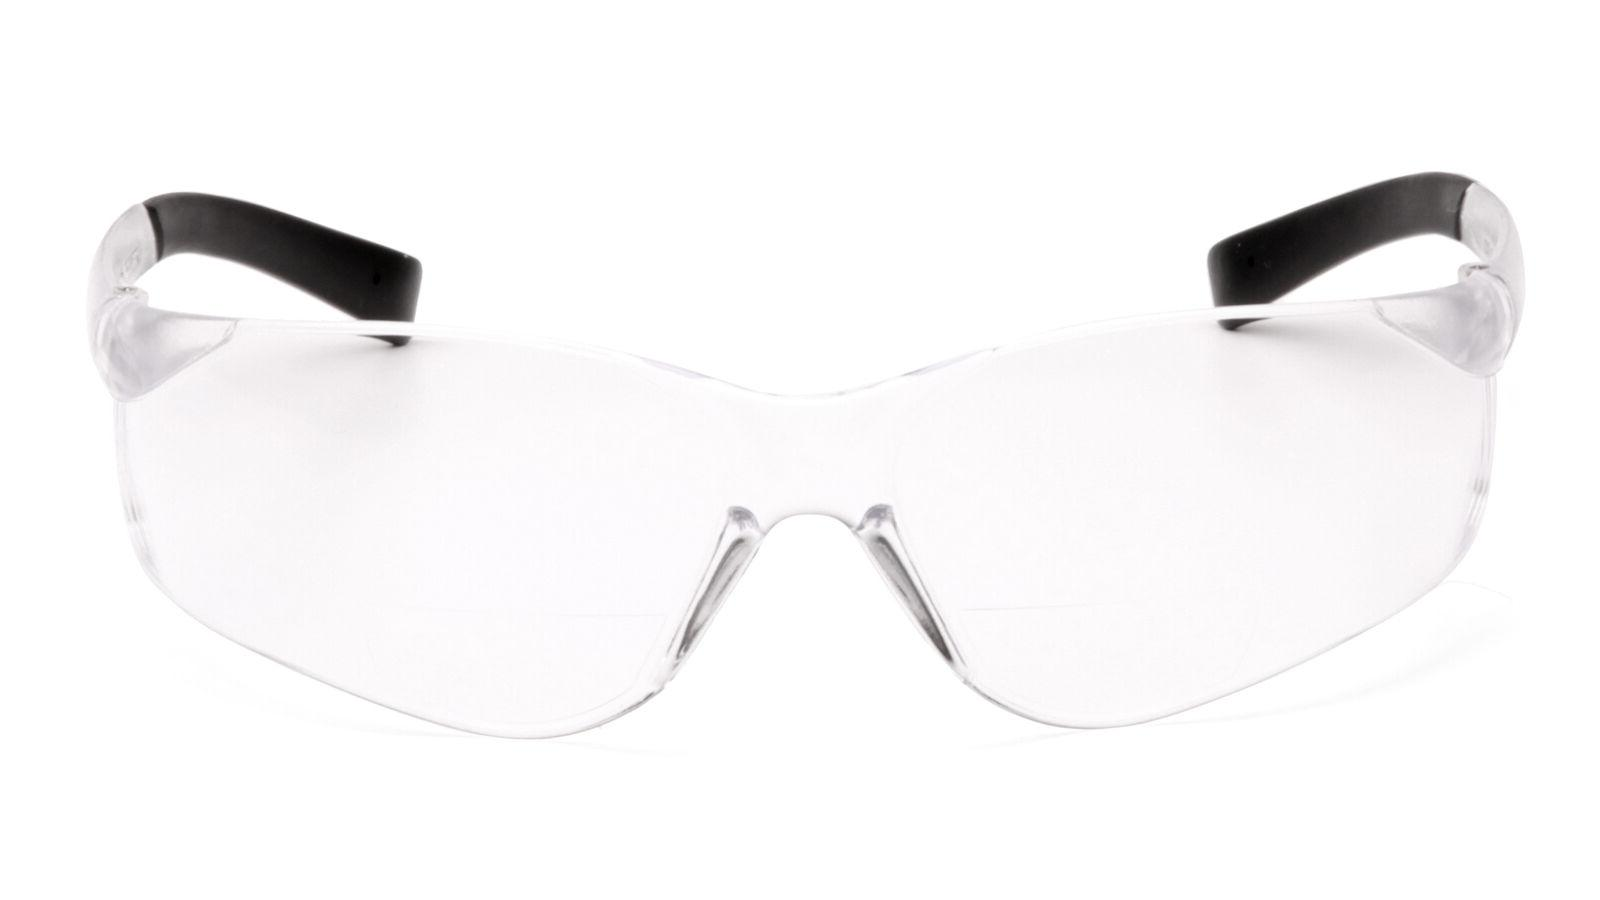 Pyramex ZTEK Readers Glasses, +1.0, +2.0 & +2.5, Bi-Focal